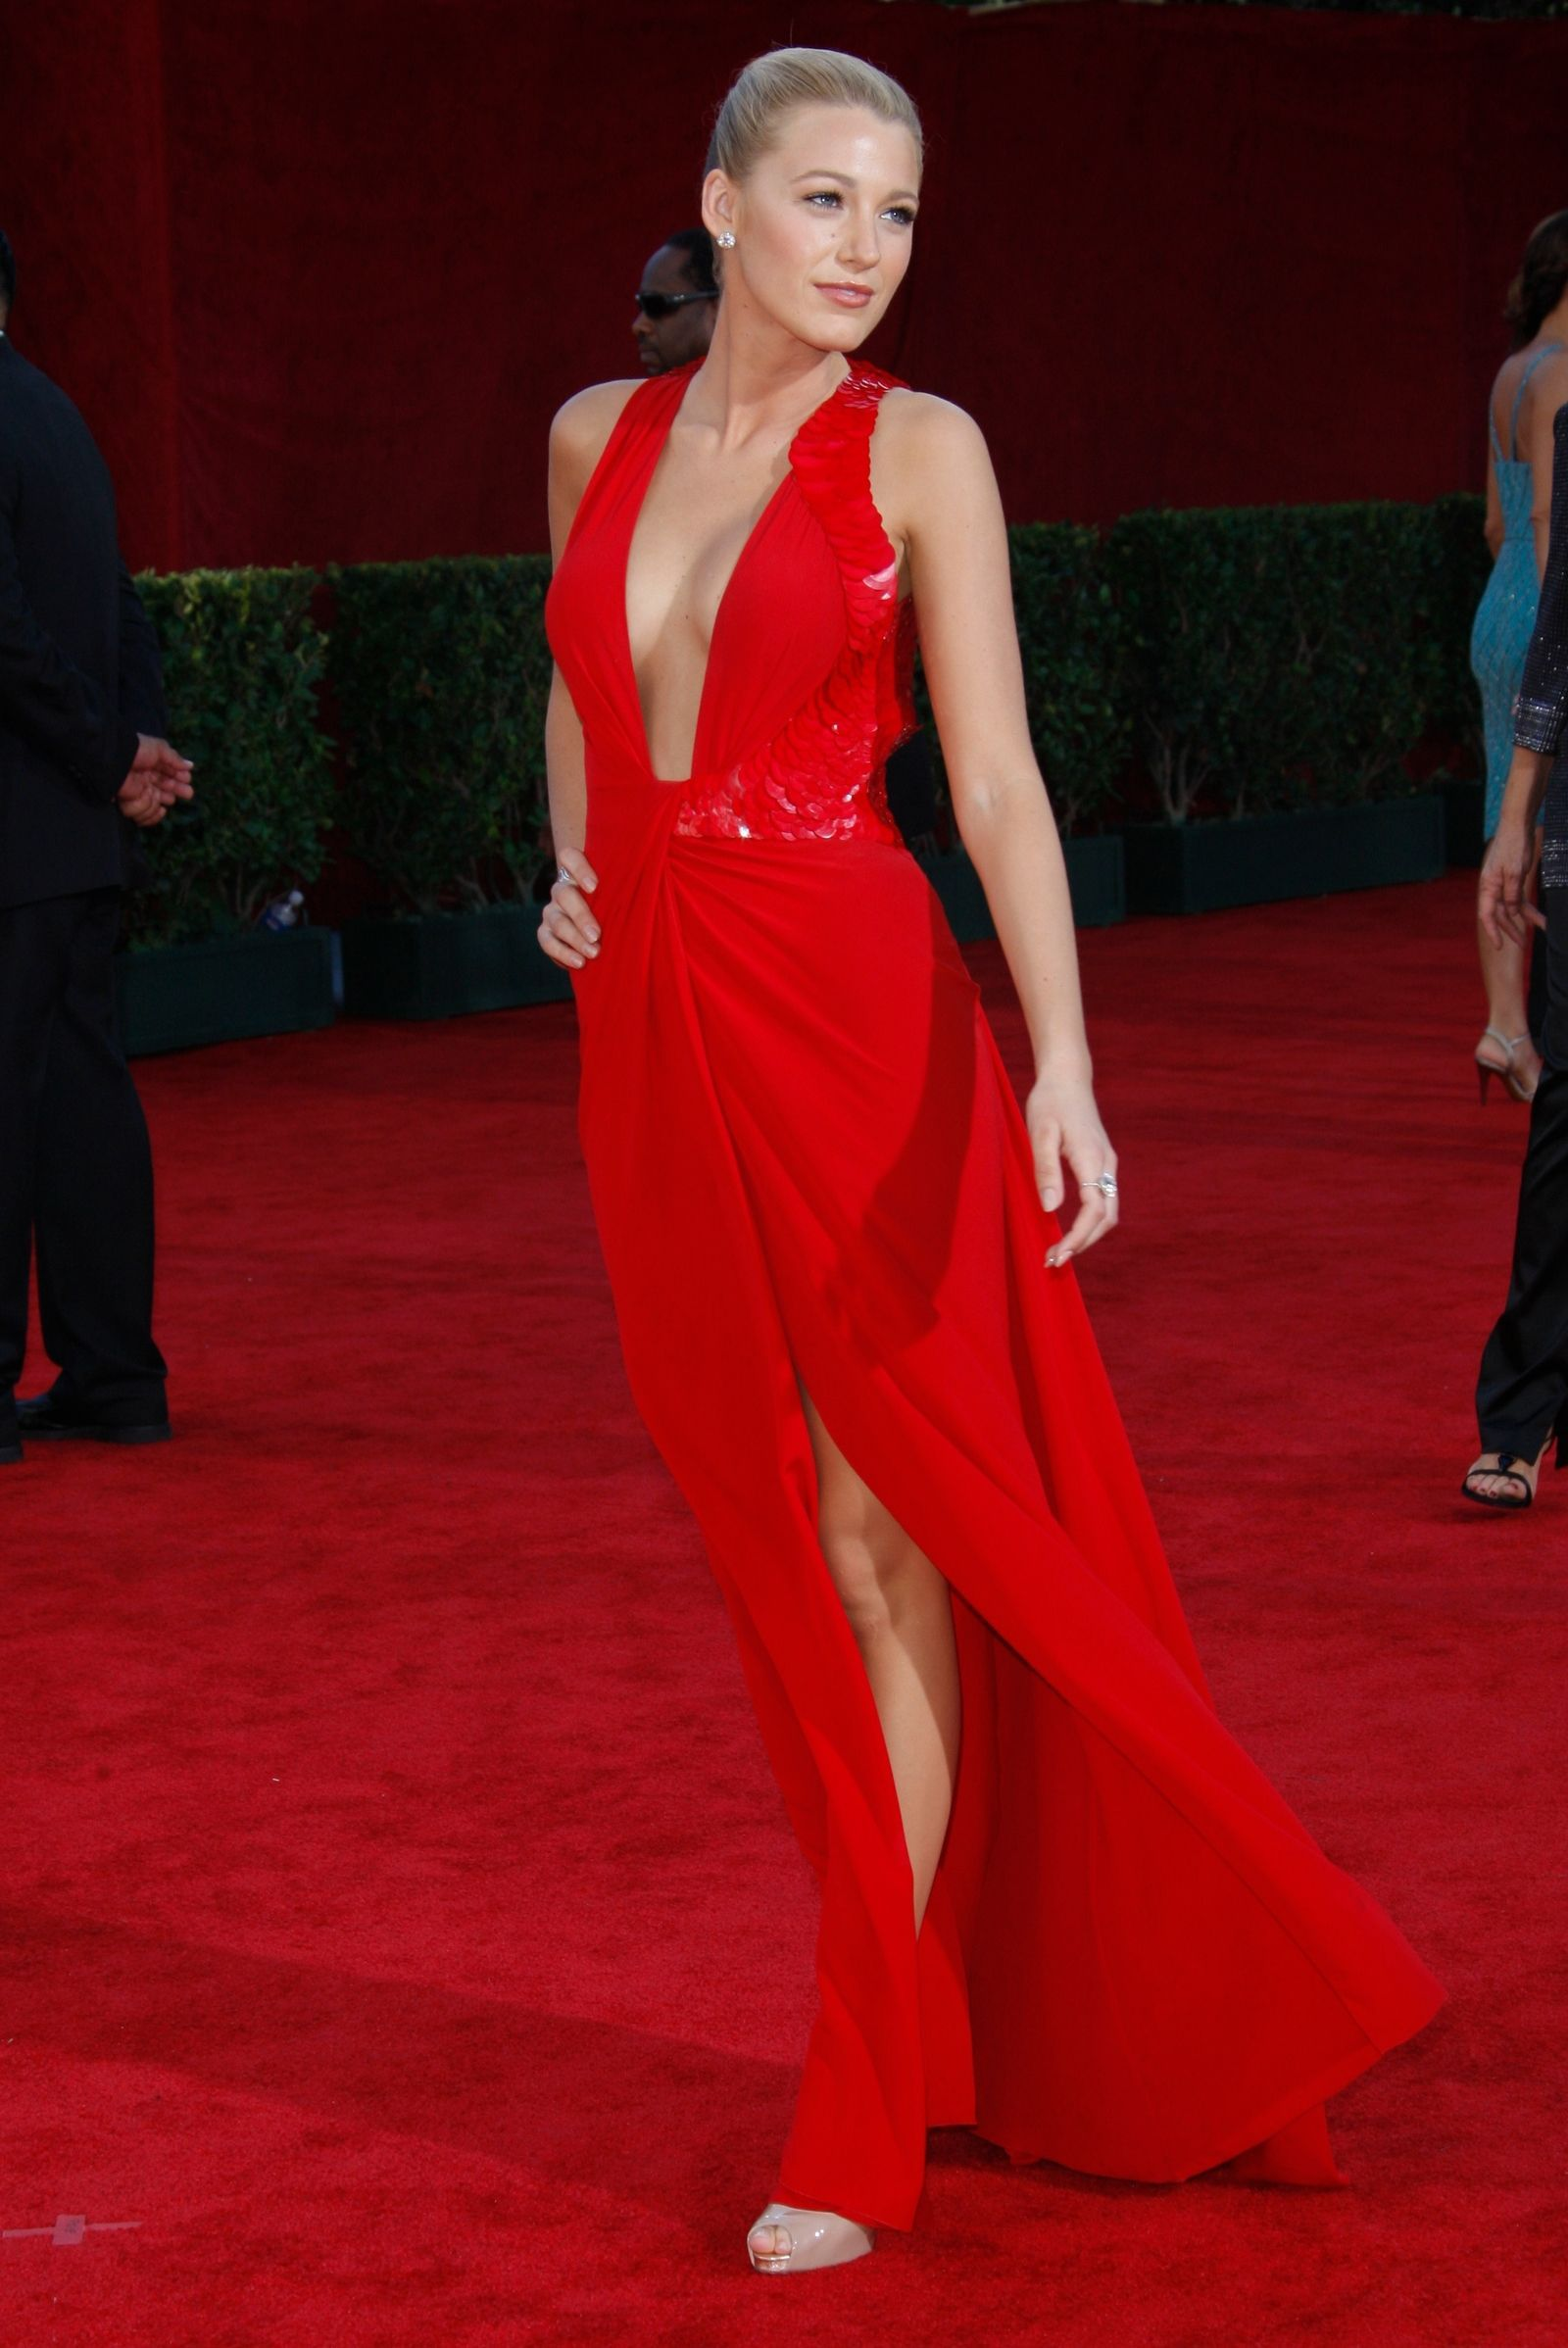 The Best Emmys Red Carpet Dresses Of All Time Modestil Rot Anziehen Kleider Fur Den Roten Teppich